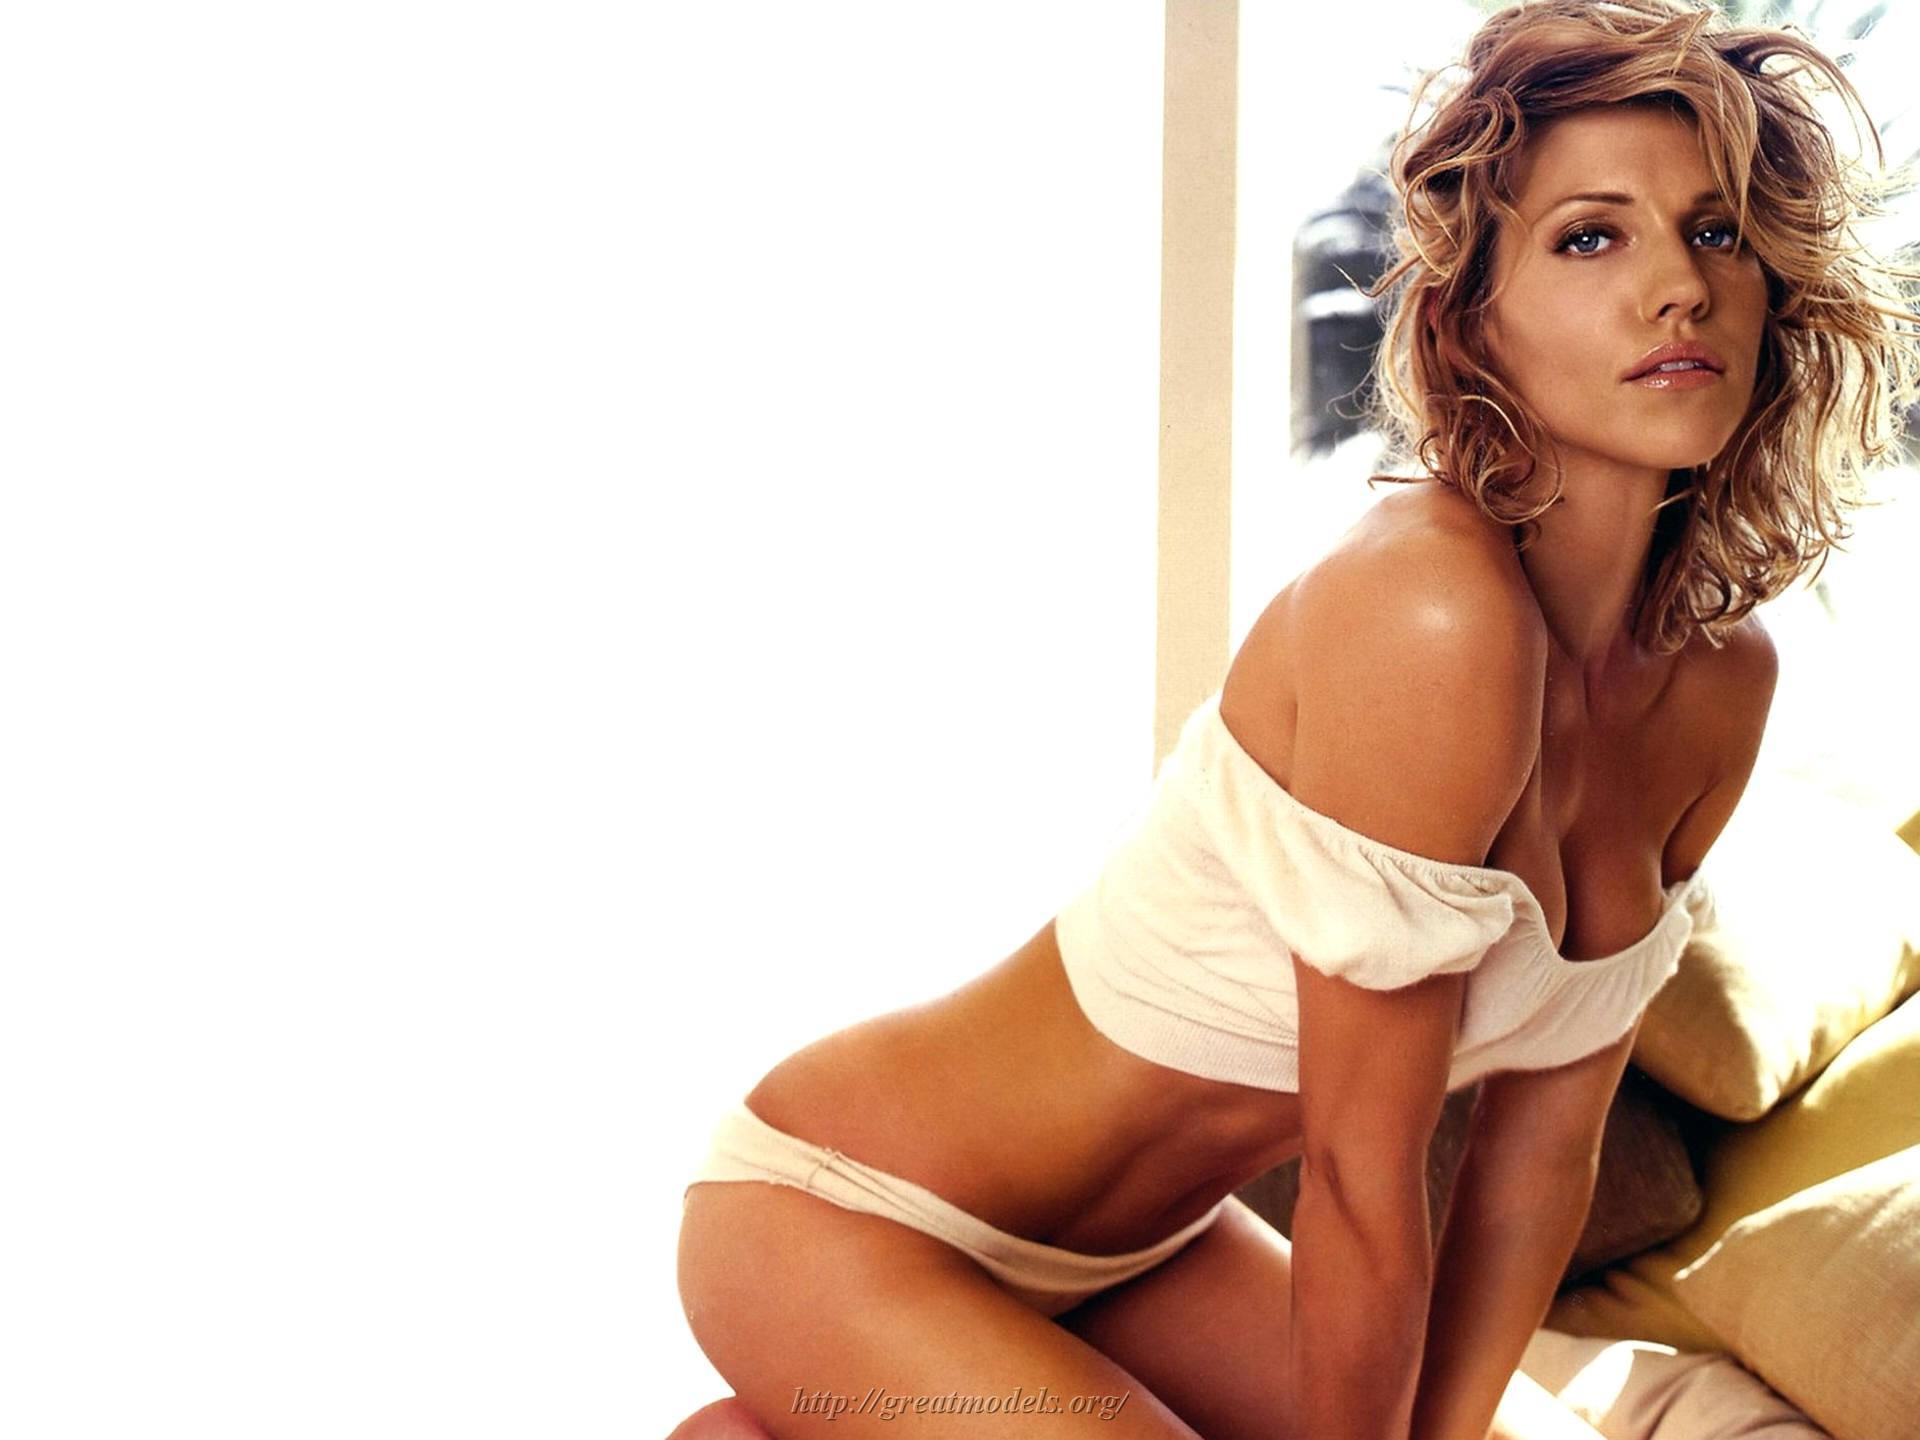 Nude female boudoir photography